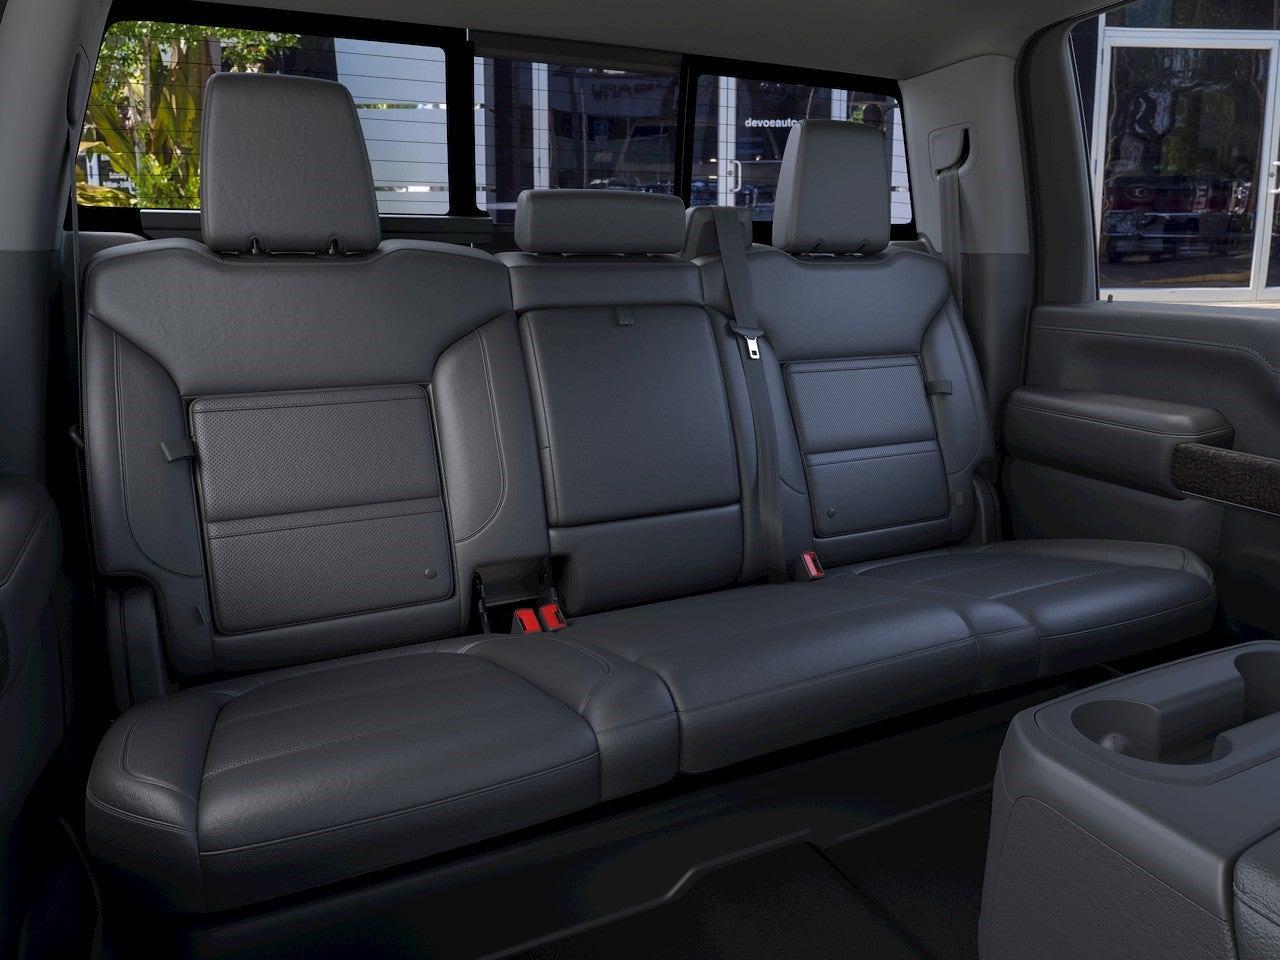 2021 GMC Sierra 2500 Crew Cab 4x4, Pickup #T21308 - photo 34